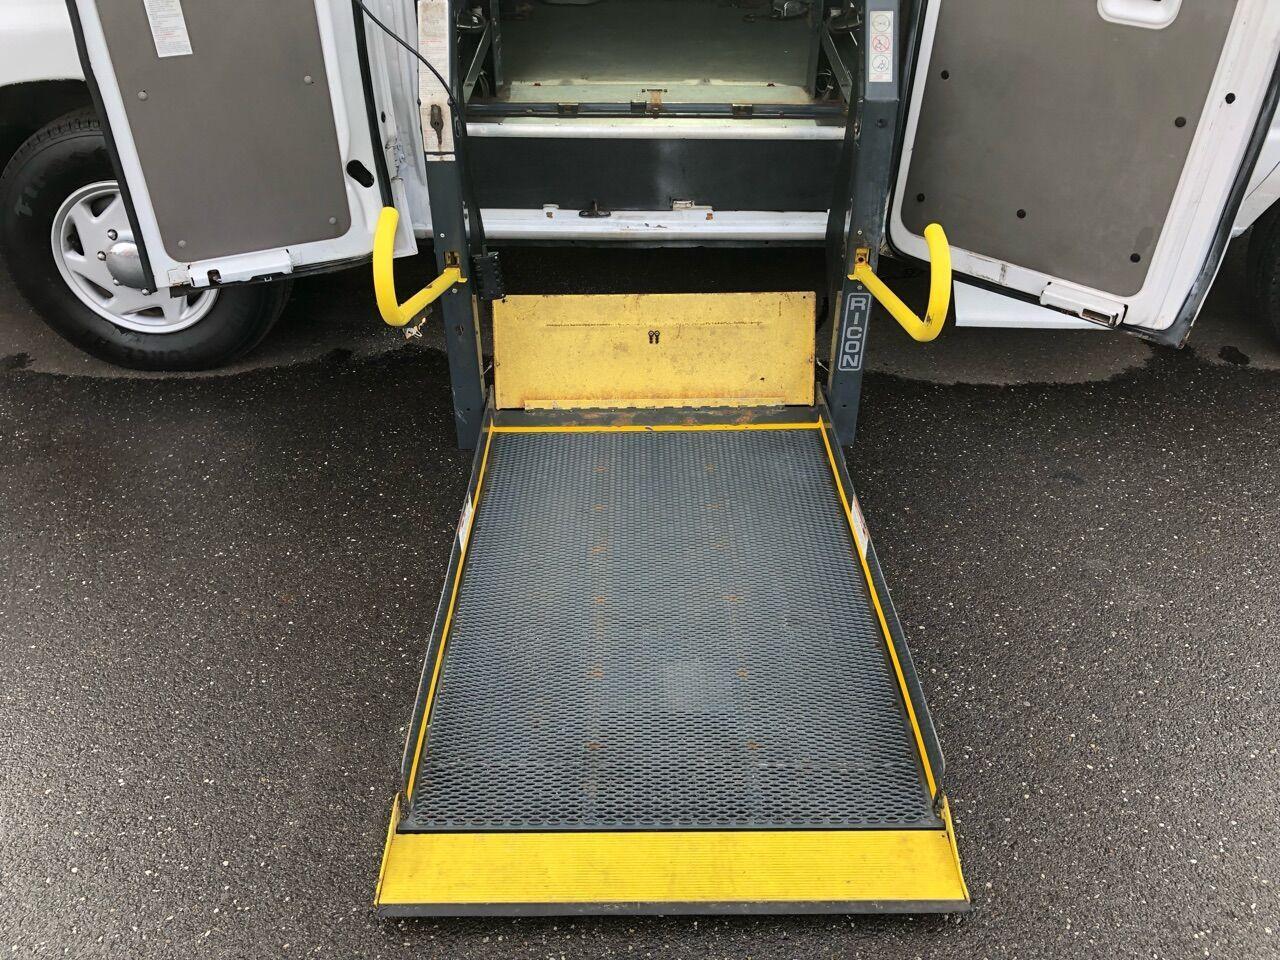 2012 Ford E-Series Cargo Full-size Cargo Van